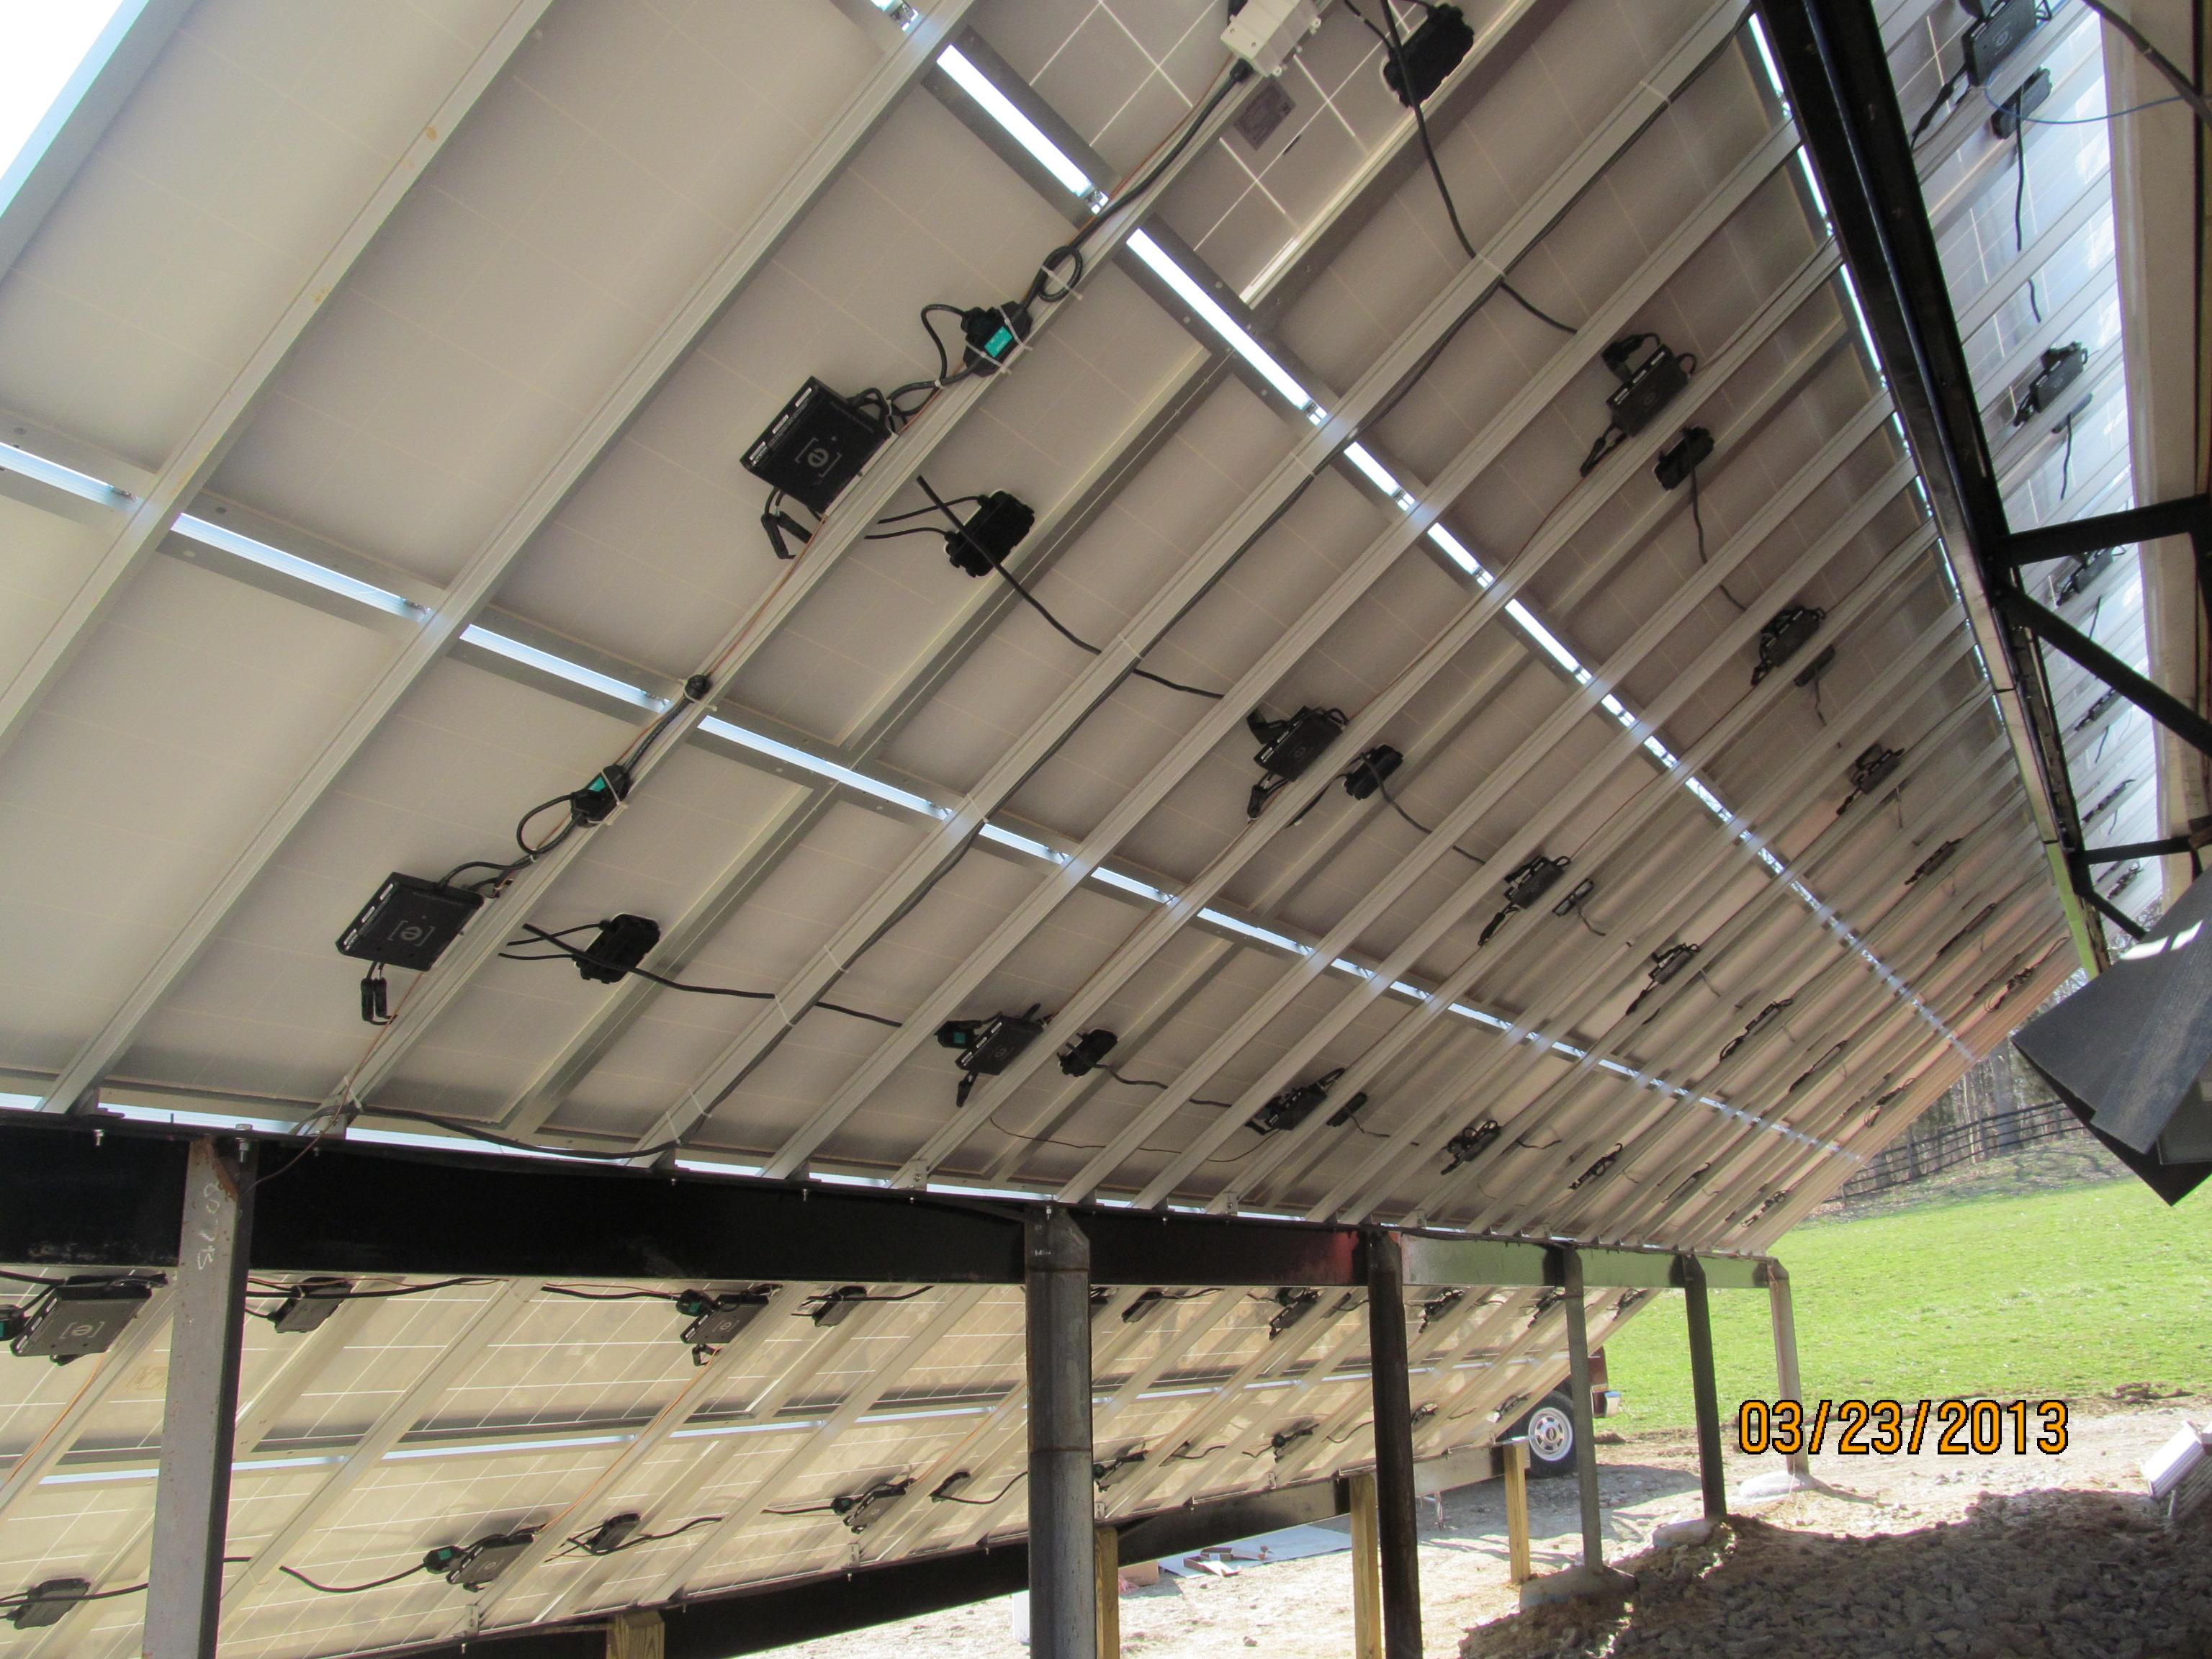 diy solar panel wiring diagram vortex flow meter panels installation